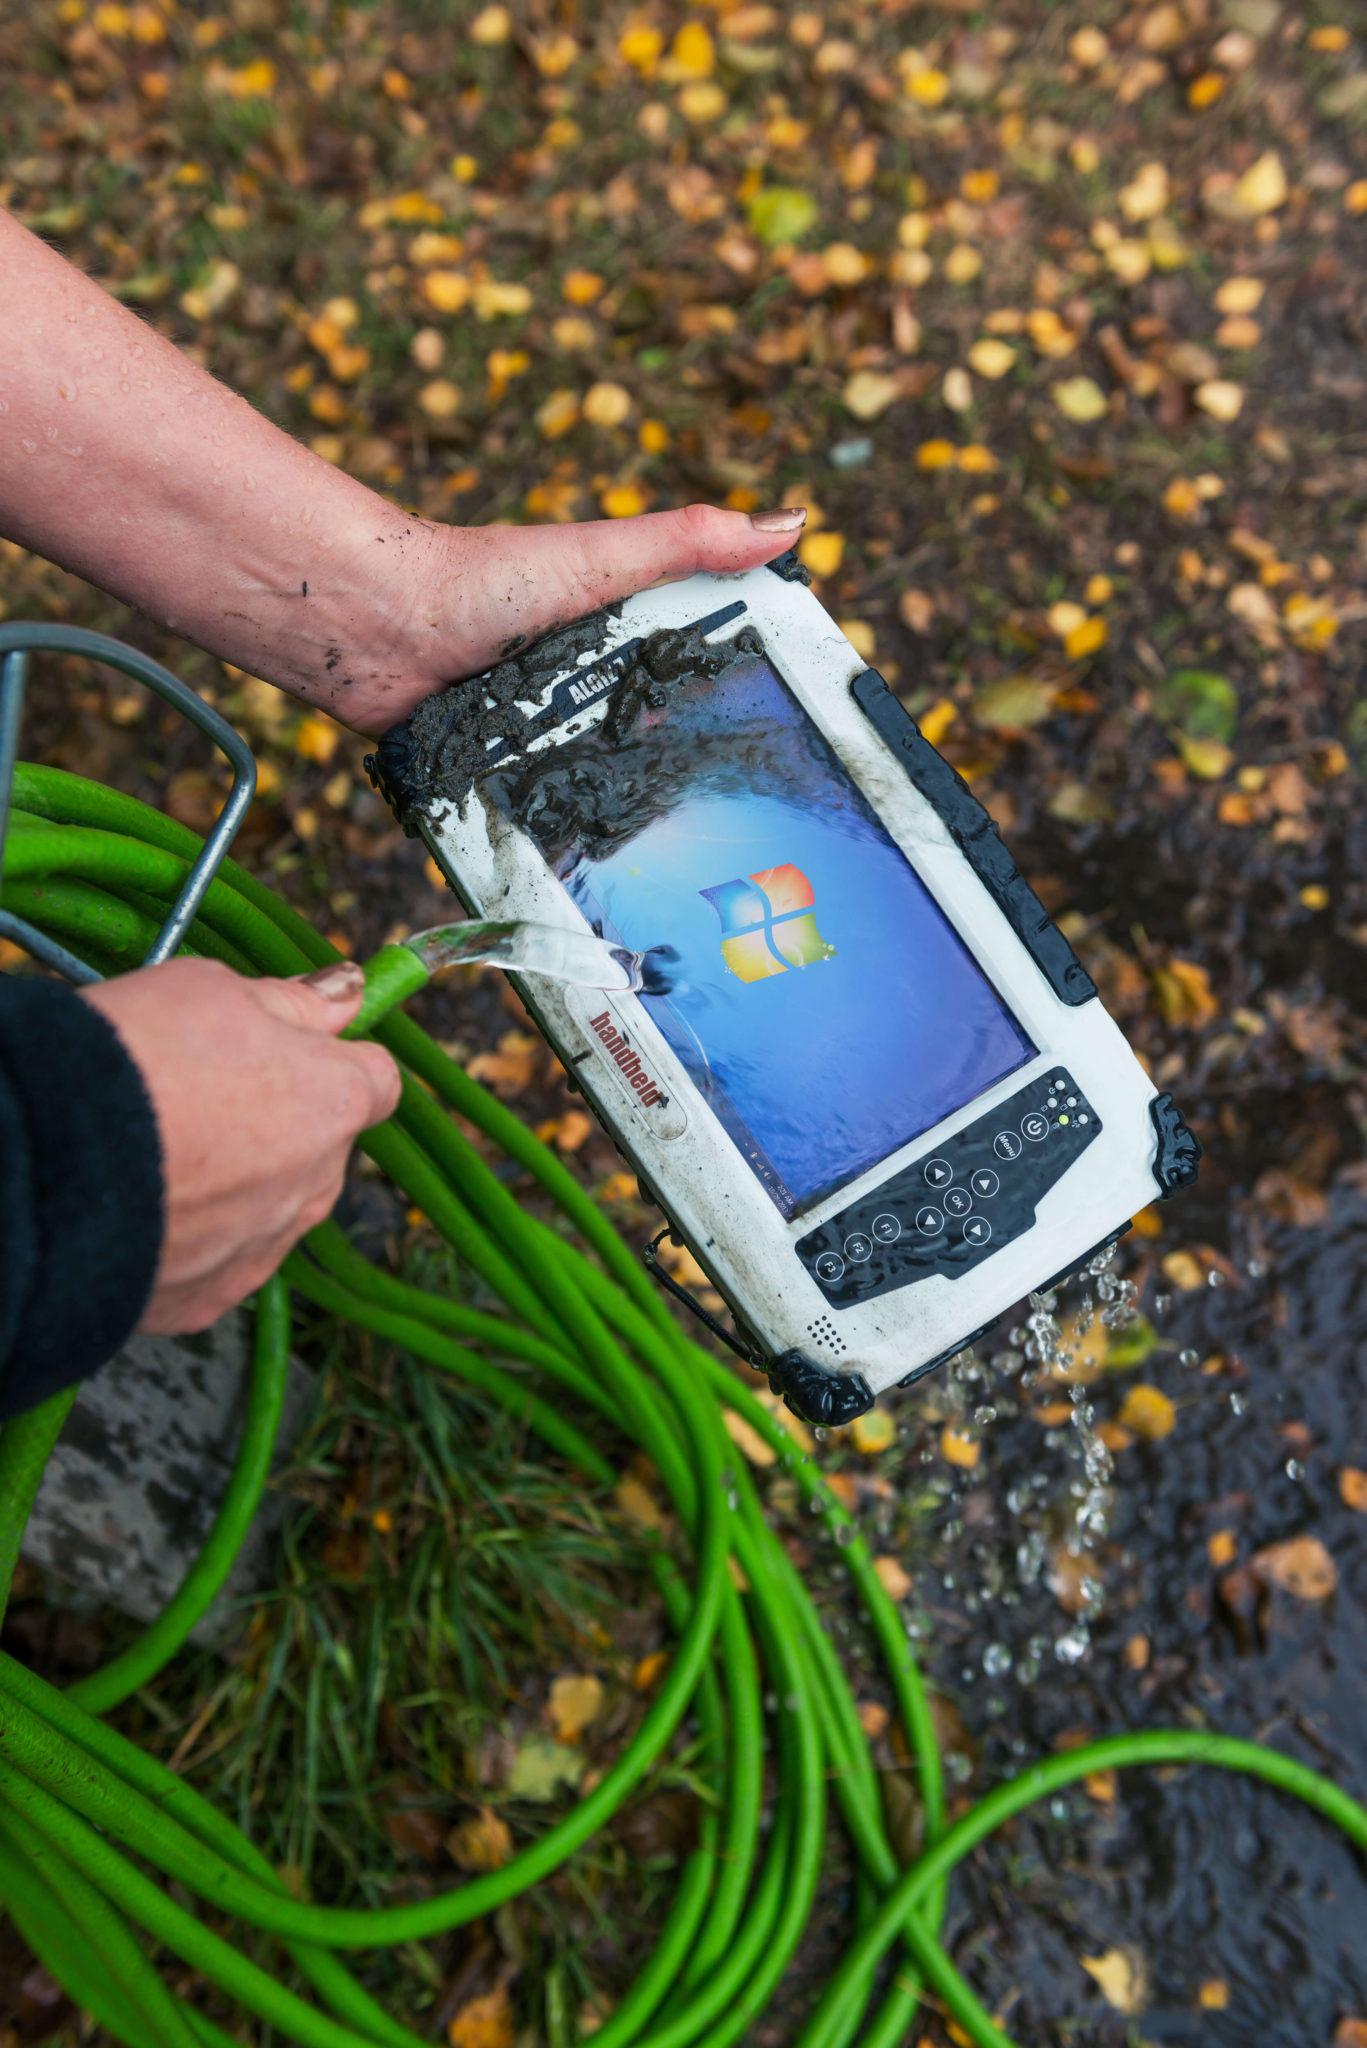 algiz-7-rugged-computers-handheld-outdoors-water-ip65